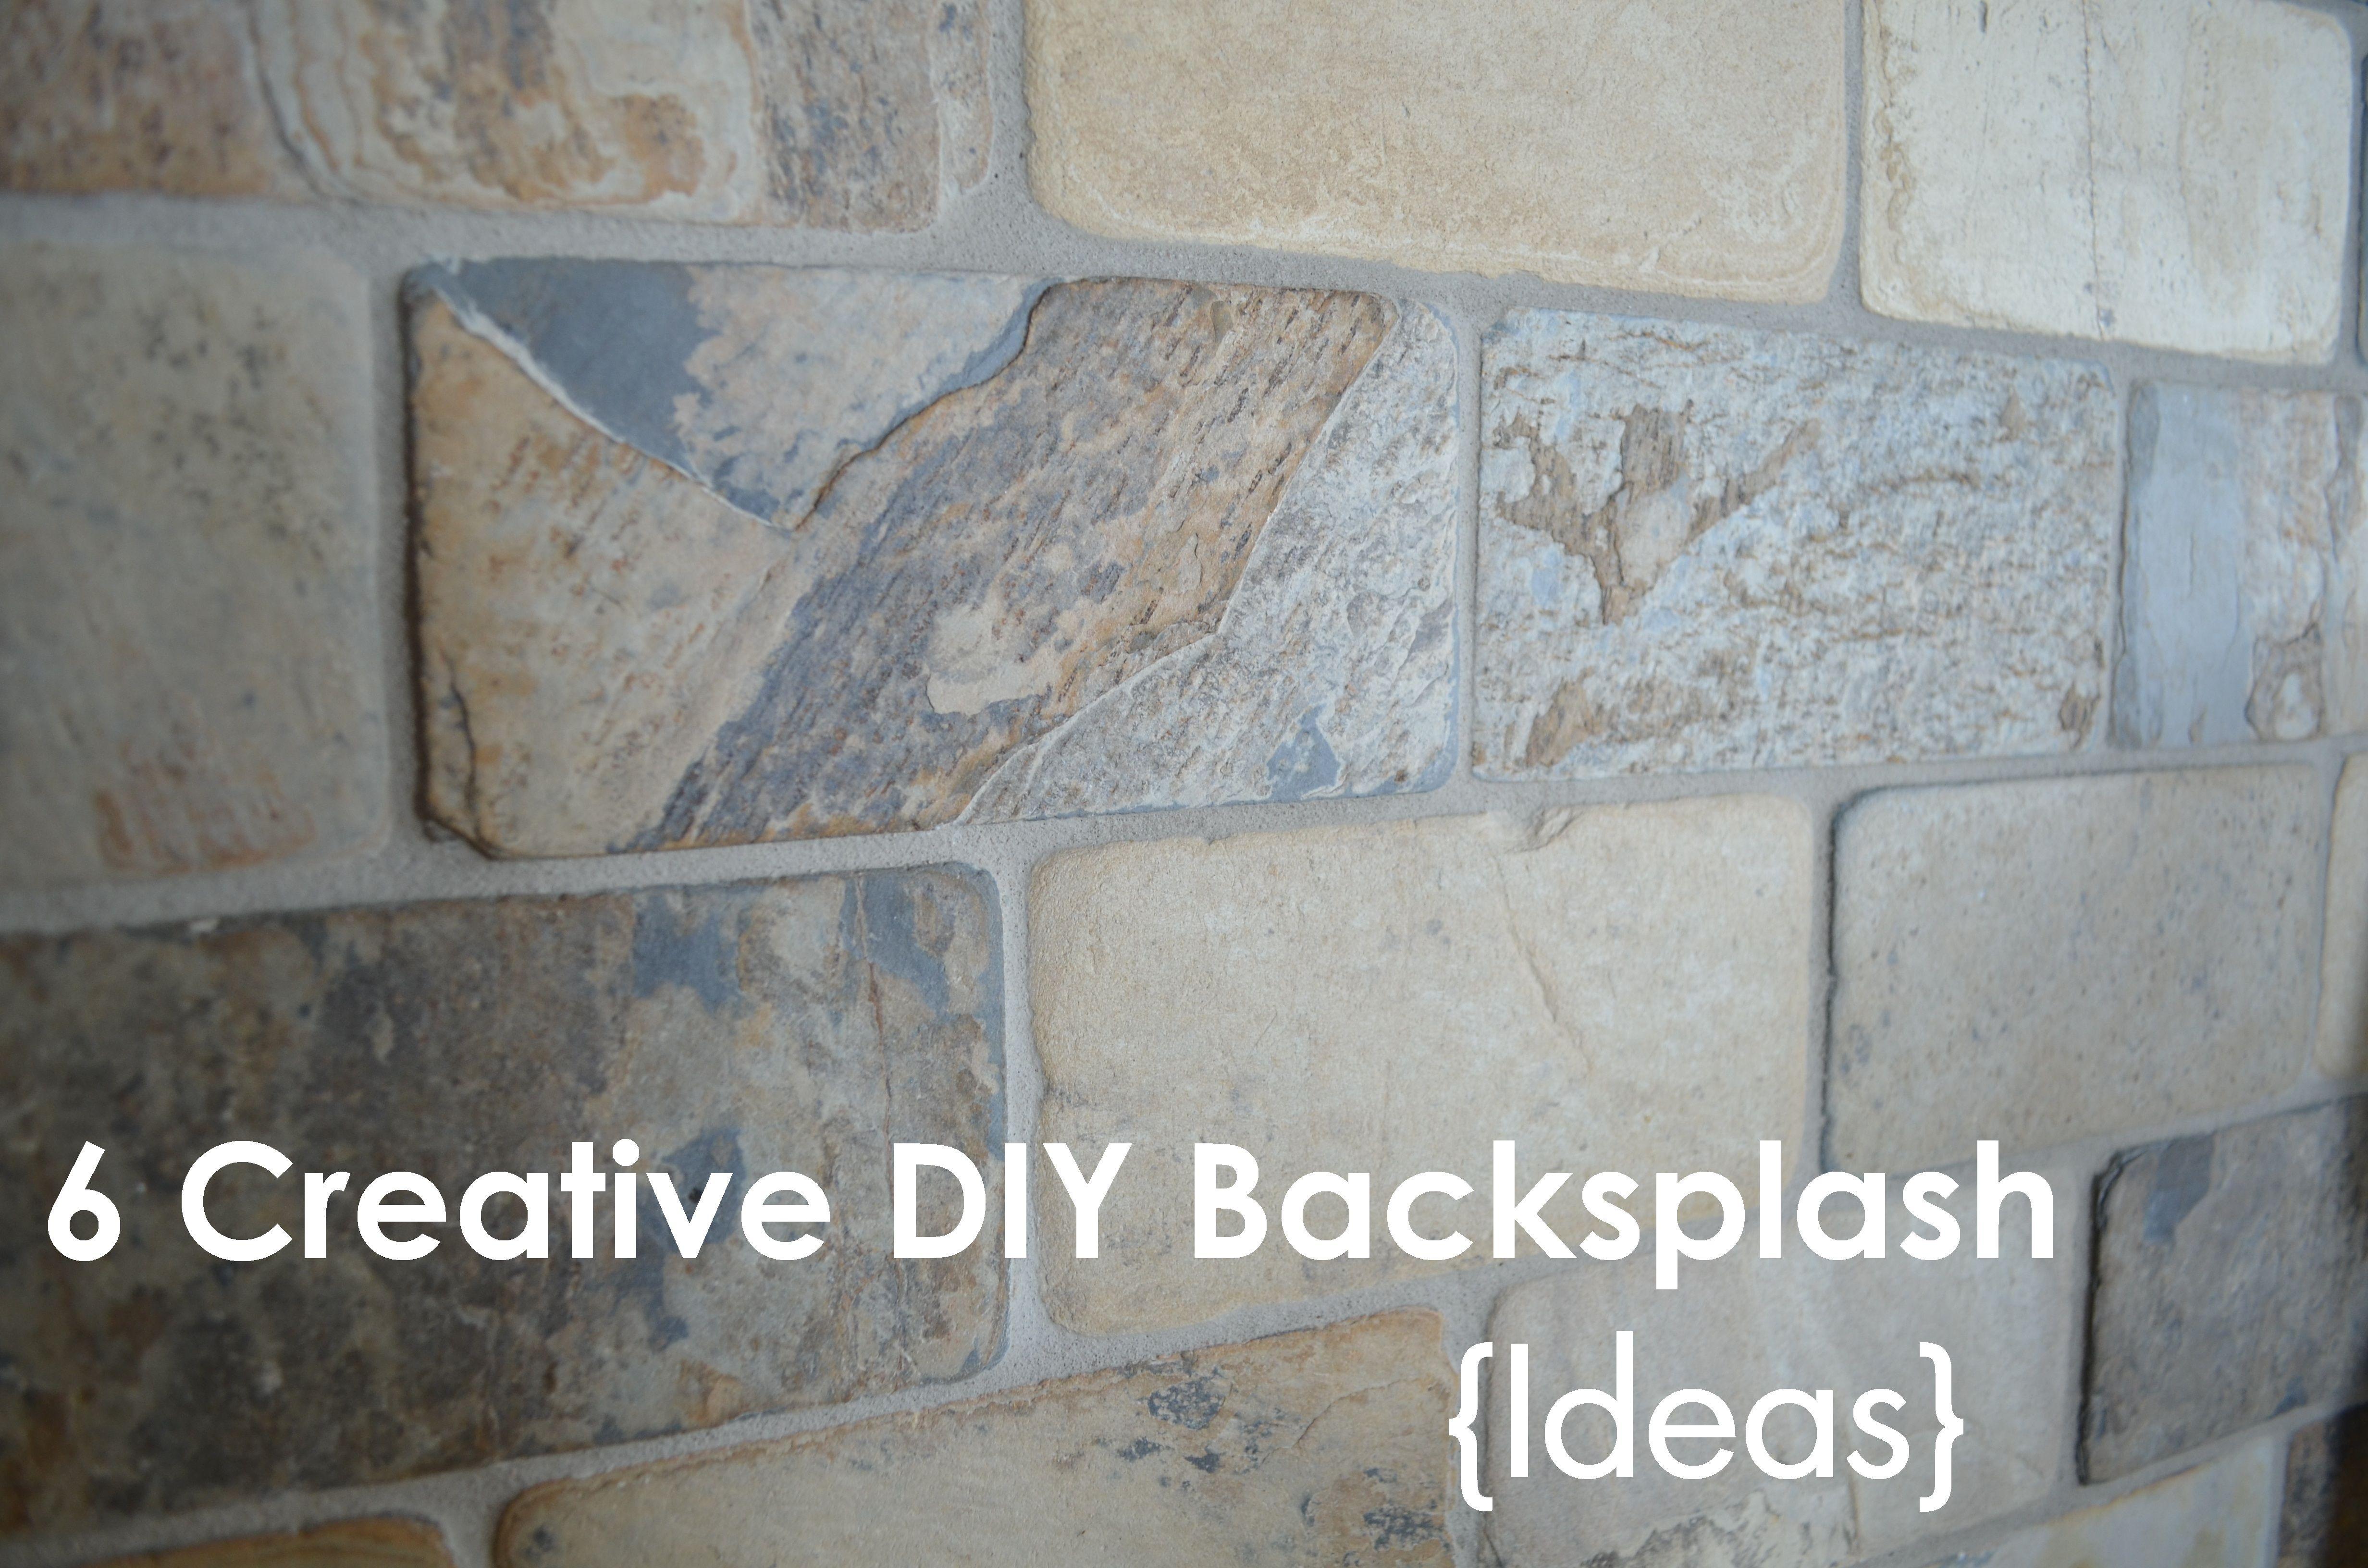 Diy Backsplash Ideas Projects And Tutorials To Love Backsplash